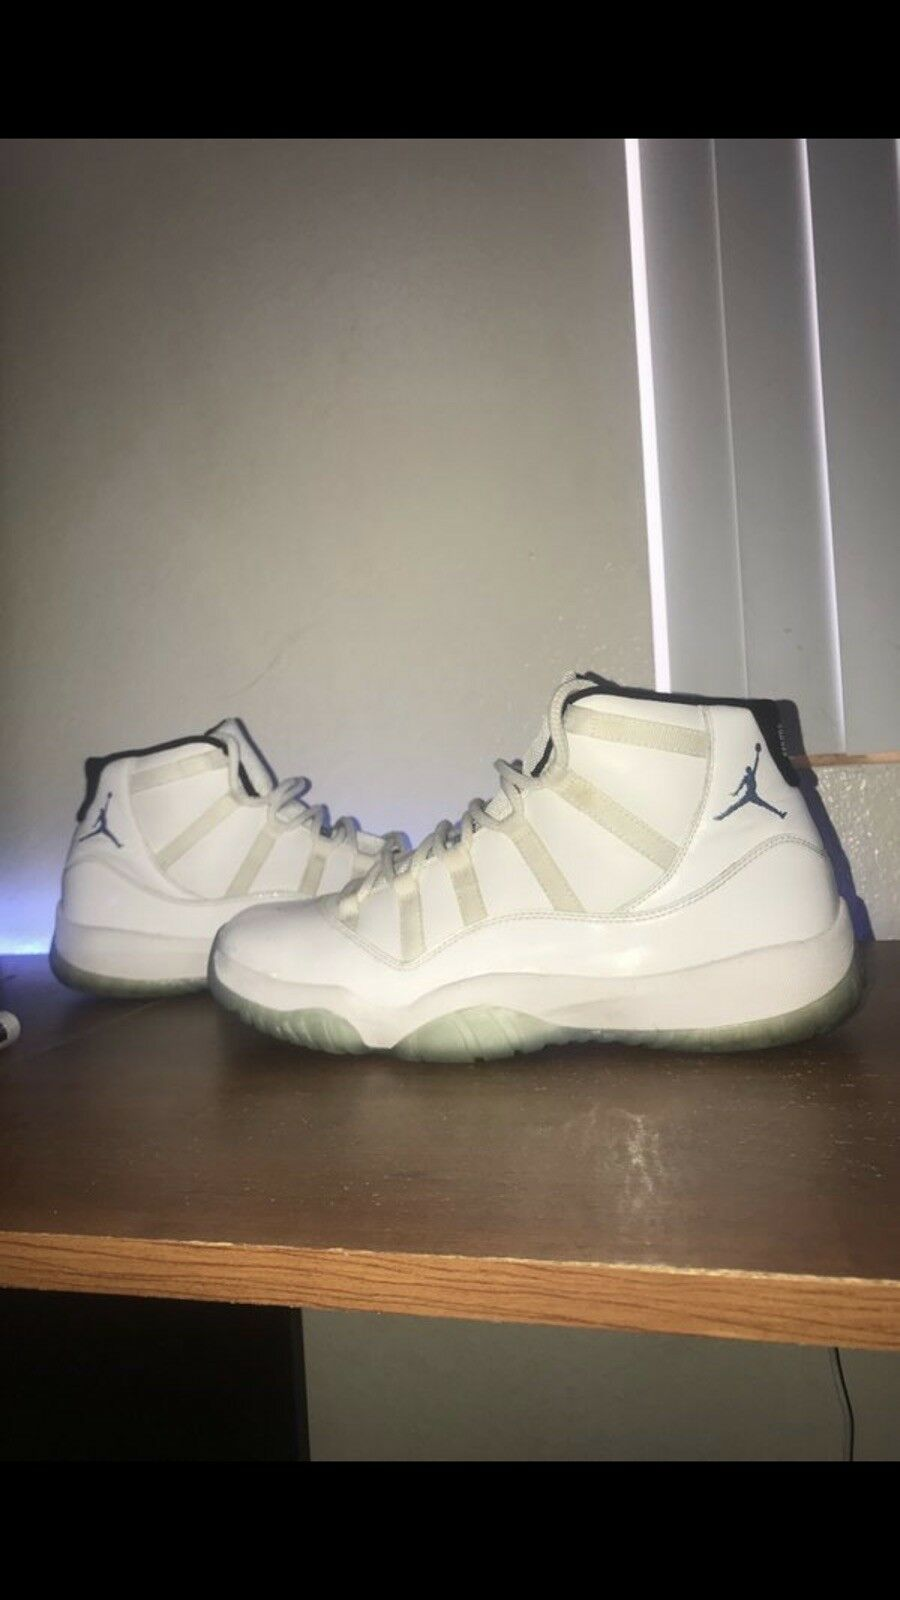 70a815f90 bluee Air 11 Legend Jordan zuisug2677-Athletic Shoes - hunting ...